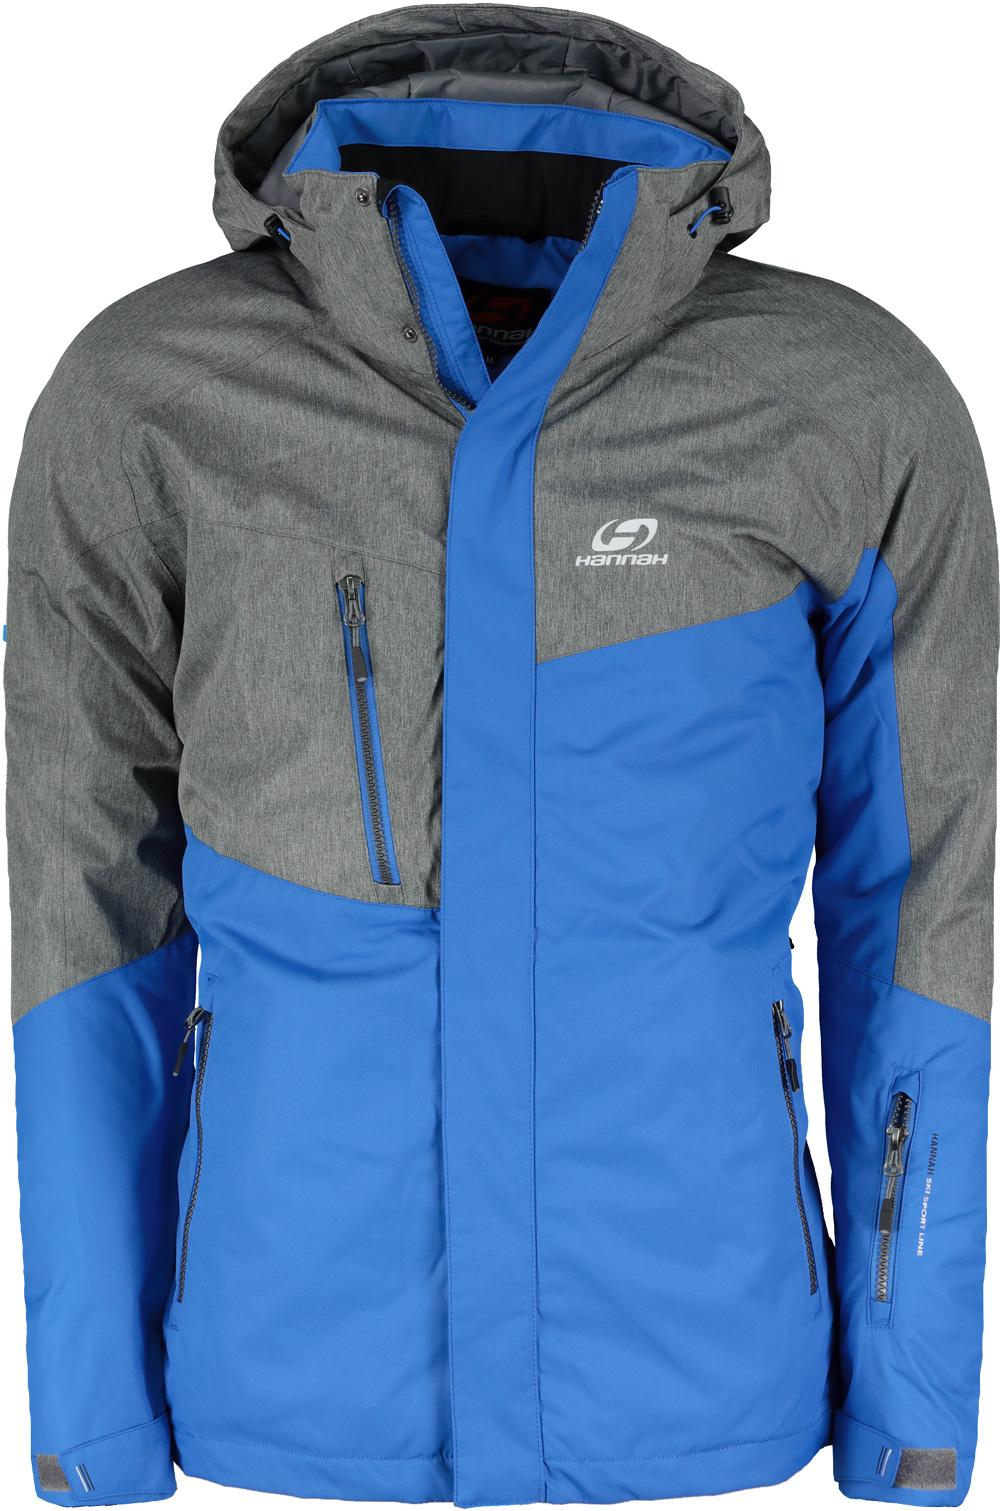 Ski jacket men's HANNAH Jabber